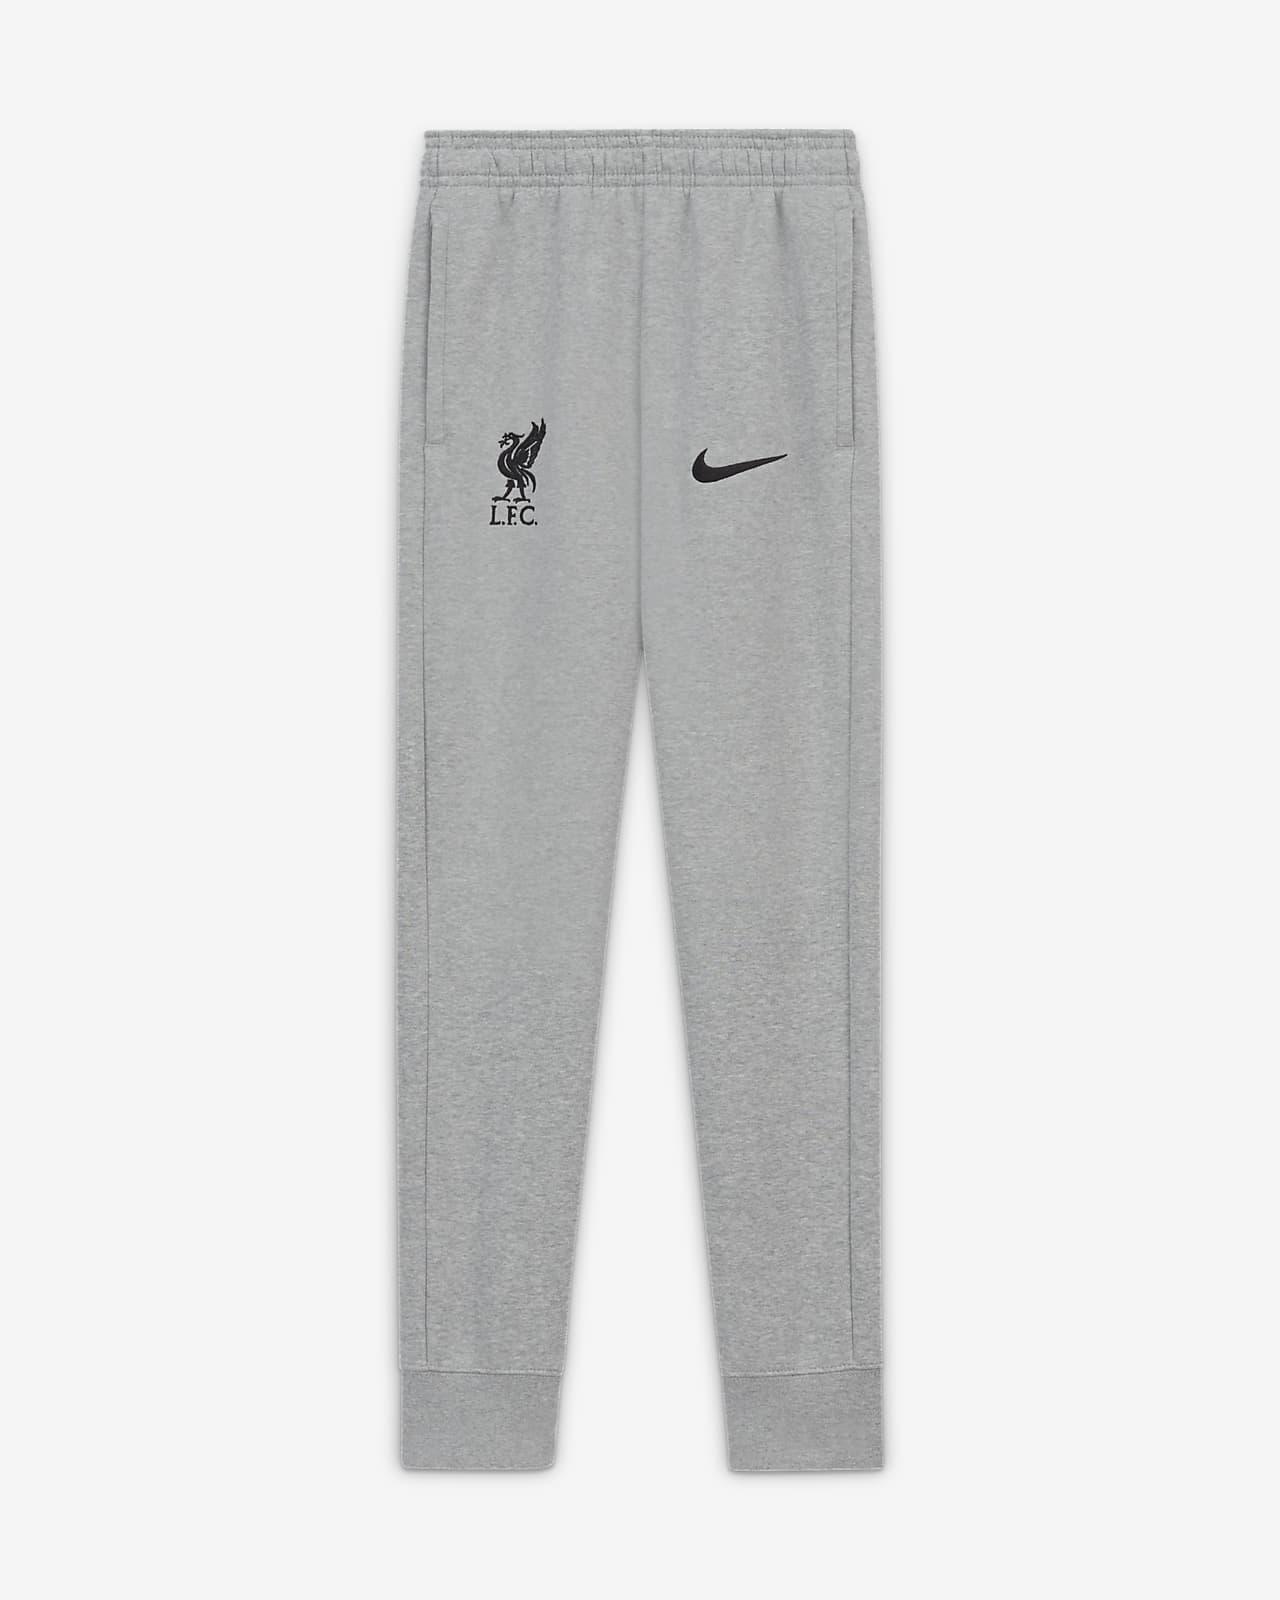 Liverpool FC Older Kids' Fleece Football Pants